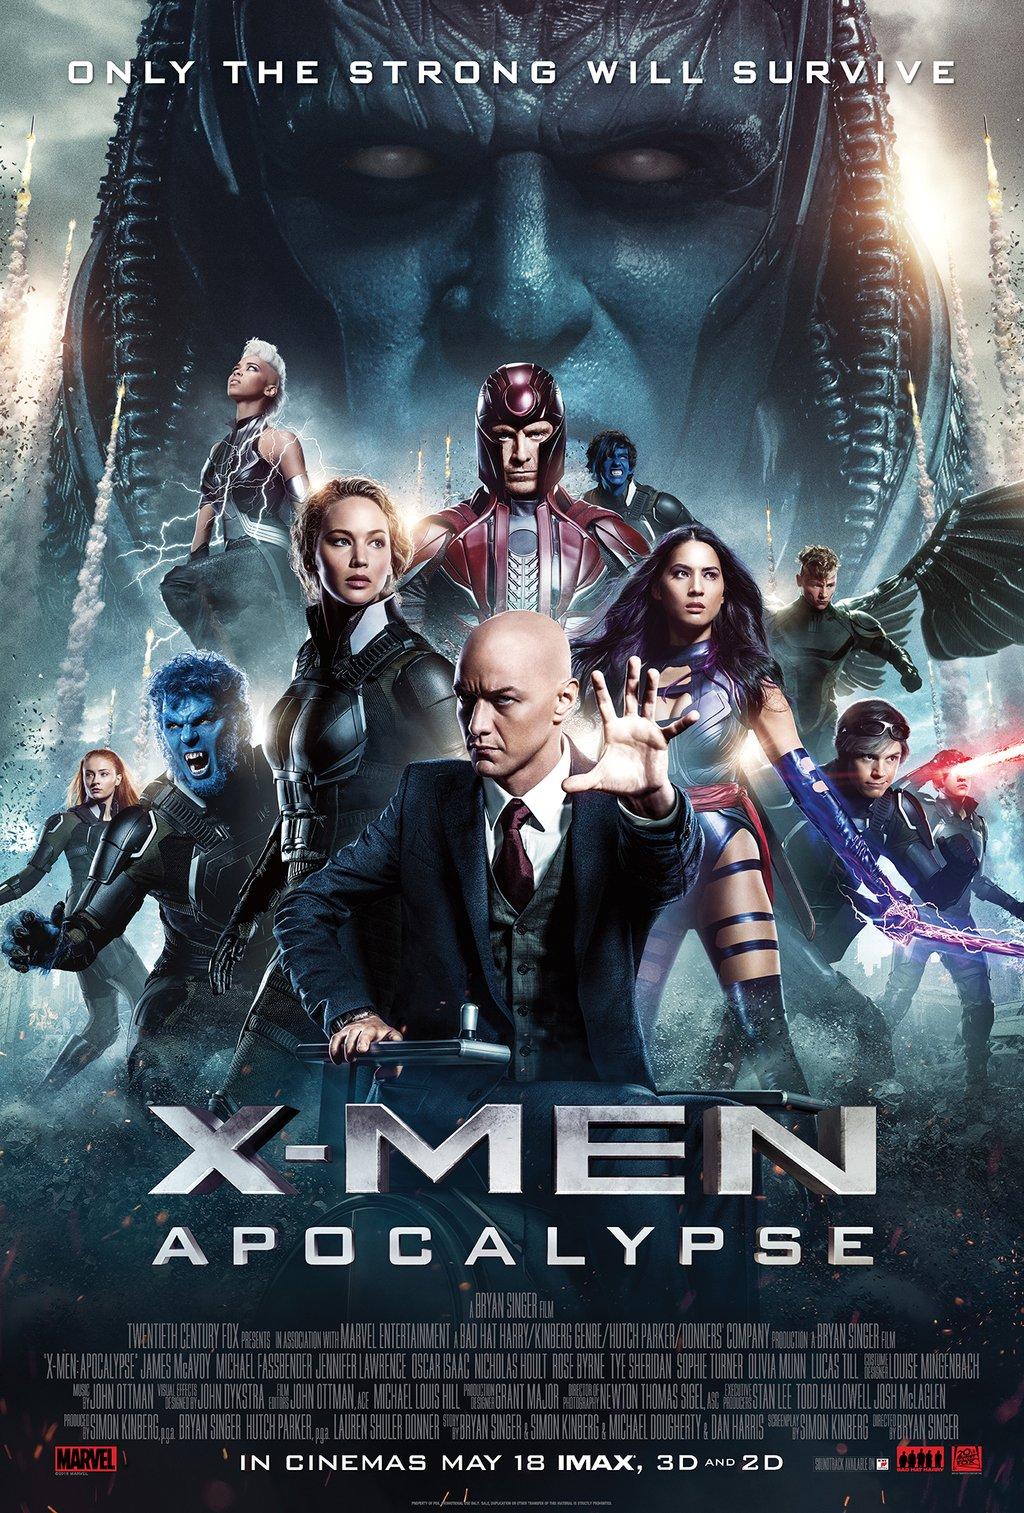 X-Men-Apocalypse-3D-imax-poster